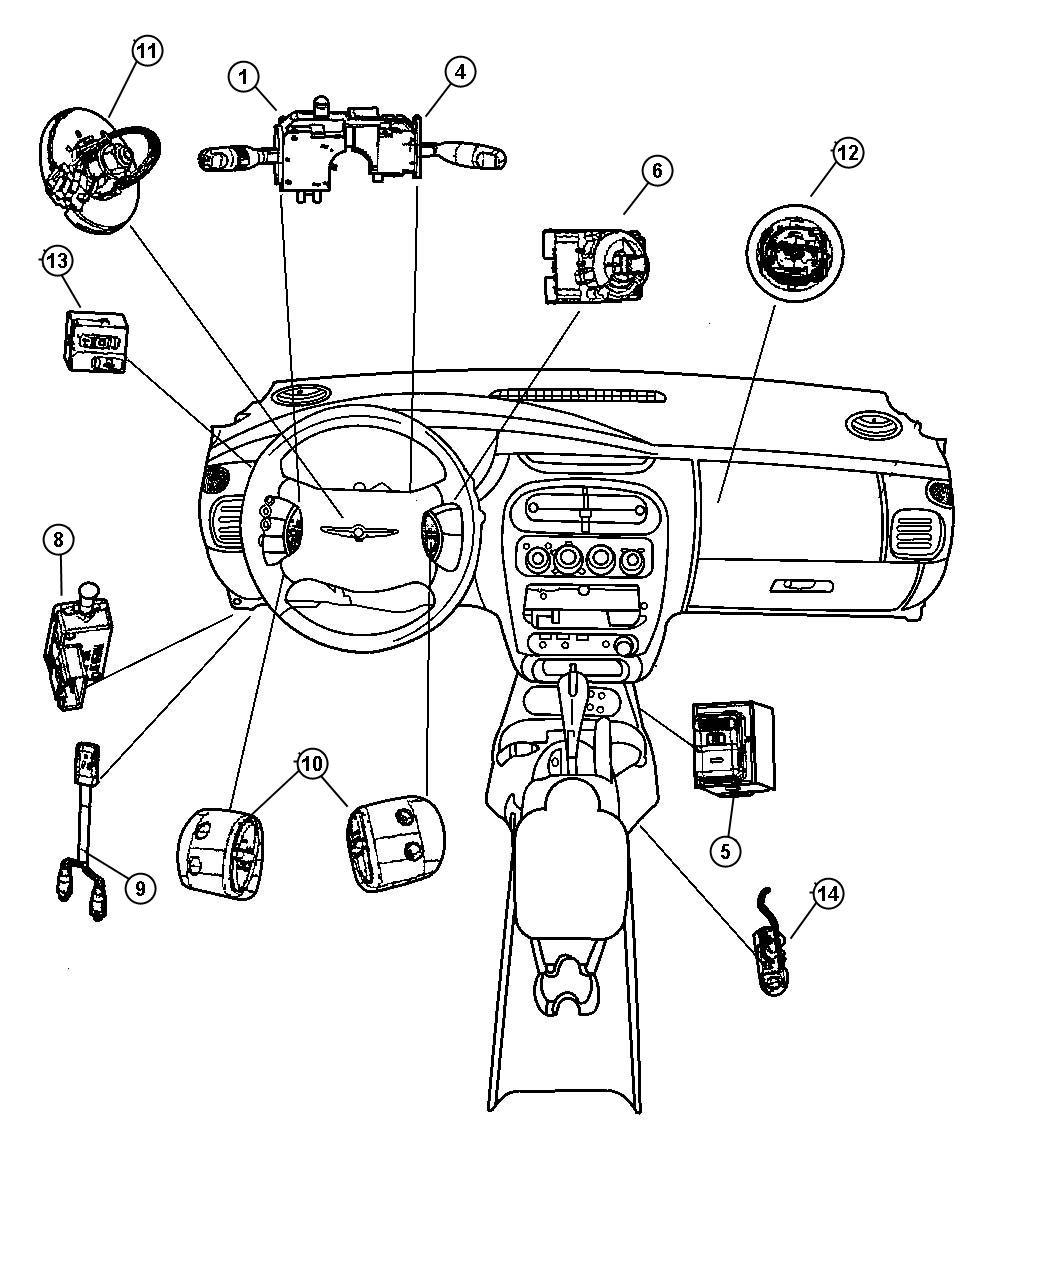 Dodge Neon Switch Ignition Steering Column Tilt